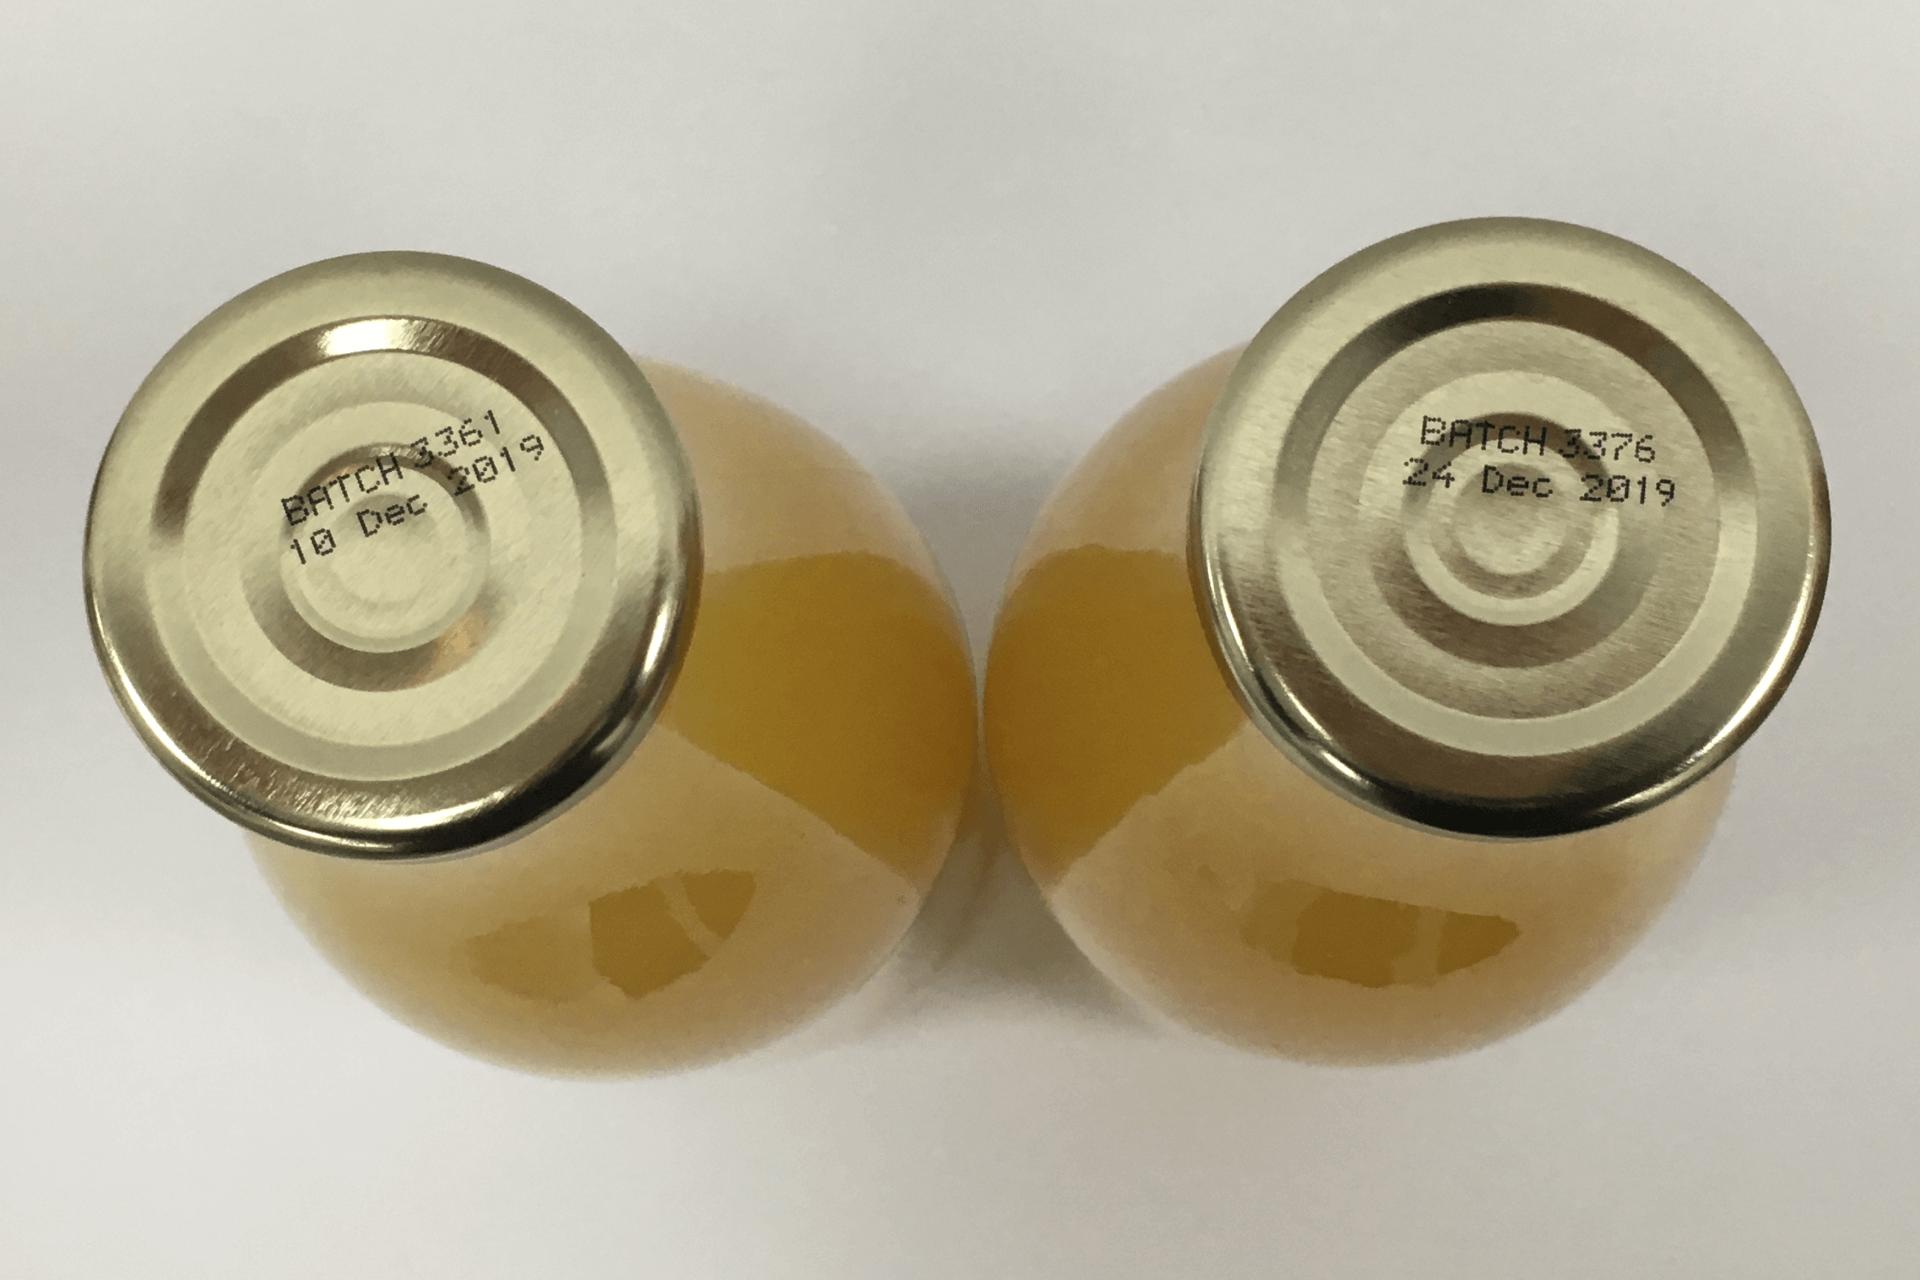 Batch Code Printer Metal Juice Bottle Lids PrintSafe